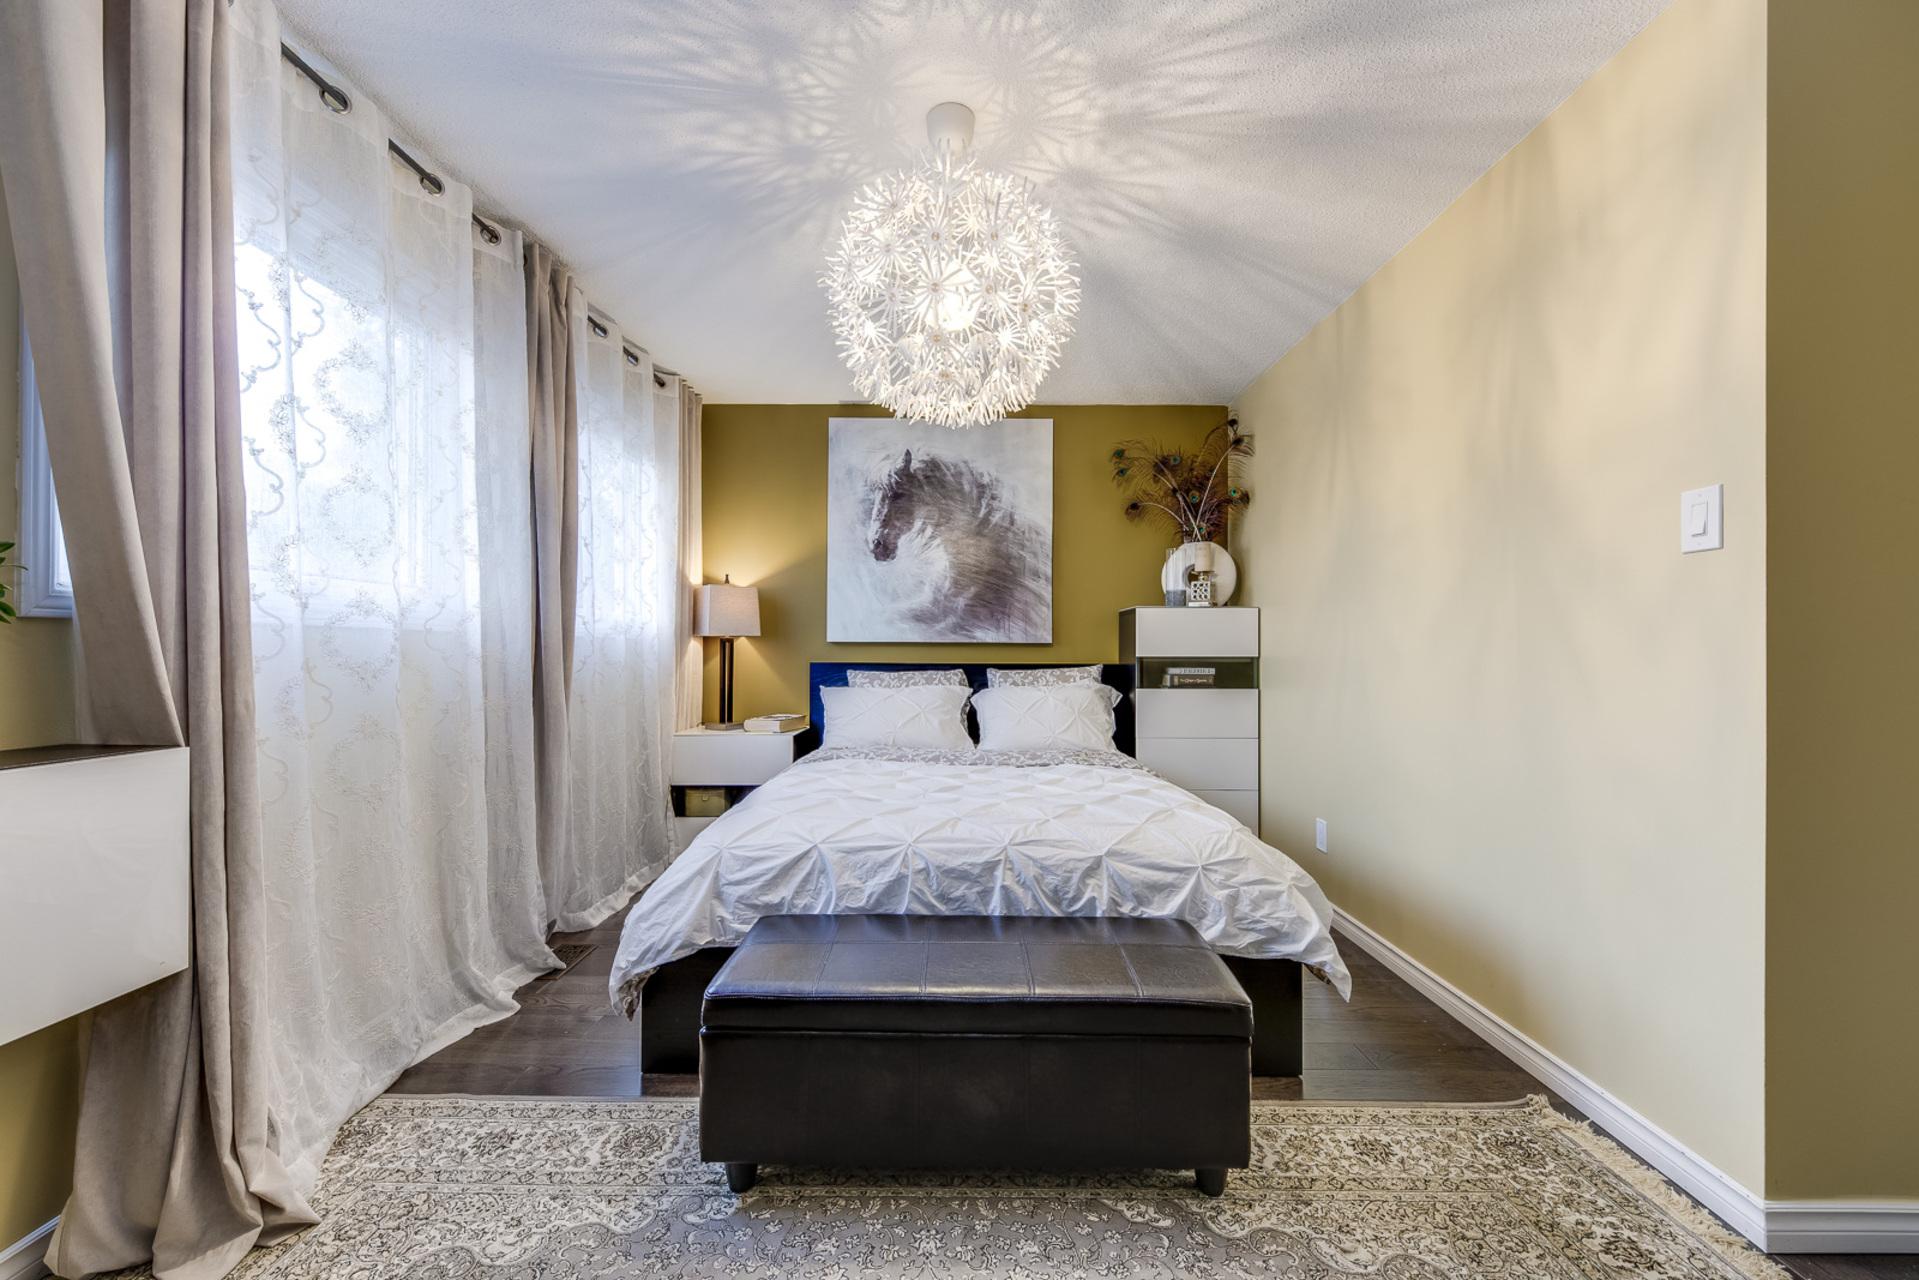 Master Bedroom - 1308 Valerie Cres, Oakville - Elite3 & Team at 1308 Valerie Crescent, Clearview, Oakville